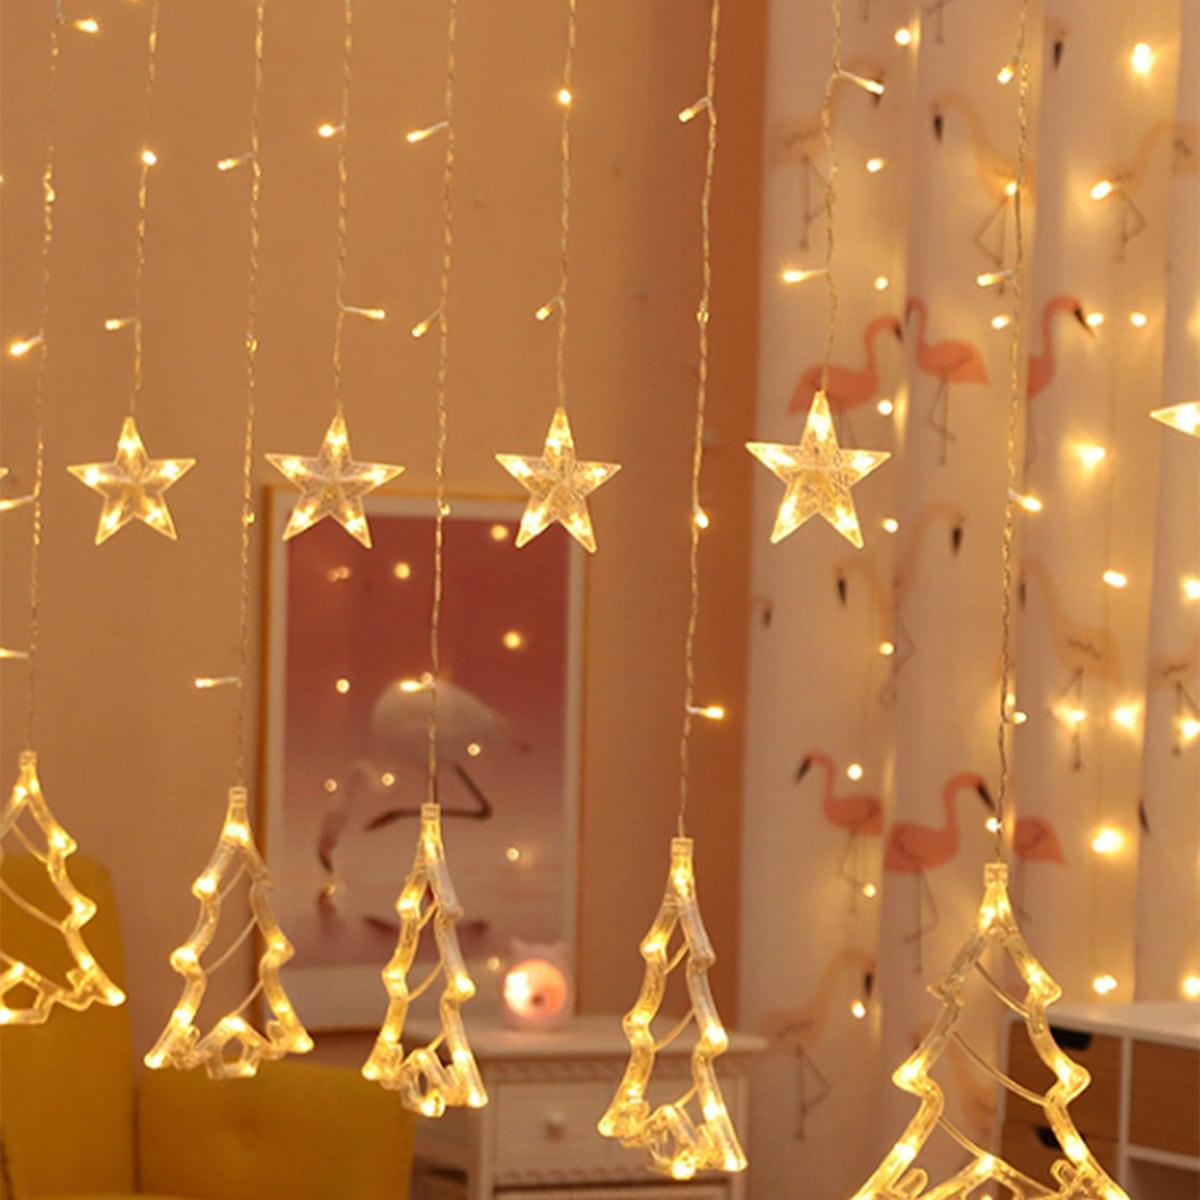 12 stks Star & Tree Shaped Bulb Curtain String Light